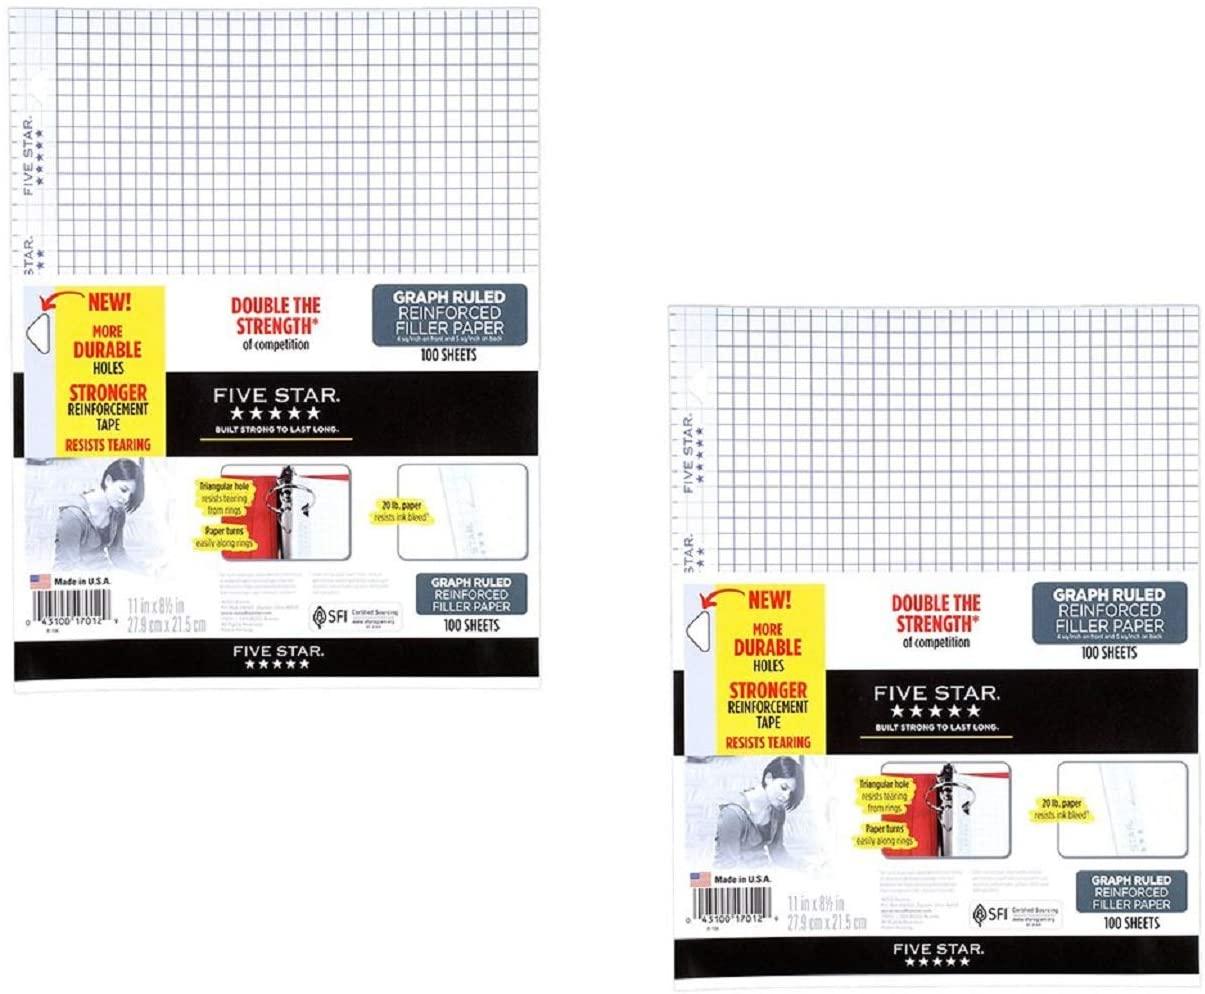 Five Star Filler Paper, Graph aZcbu Ruled, Reinforced, Loose-Leaf, 11 x 8 1/2